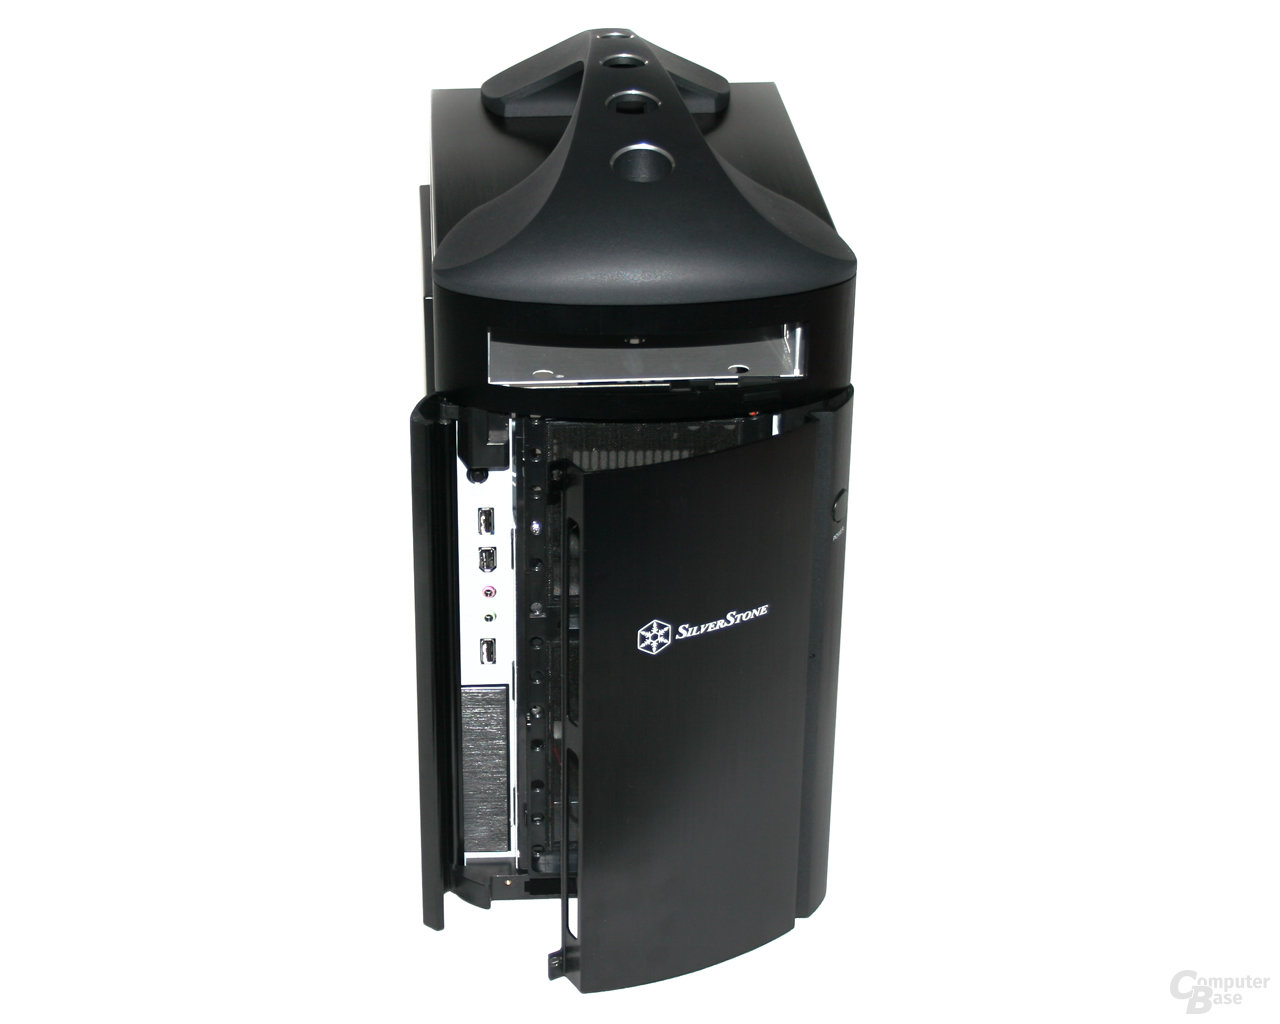 Silverstone SG04B-FH Sugo – Front Tür